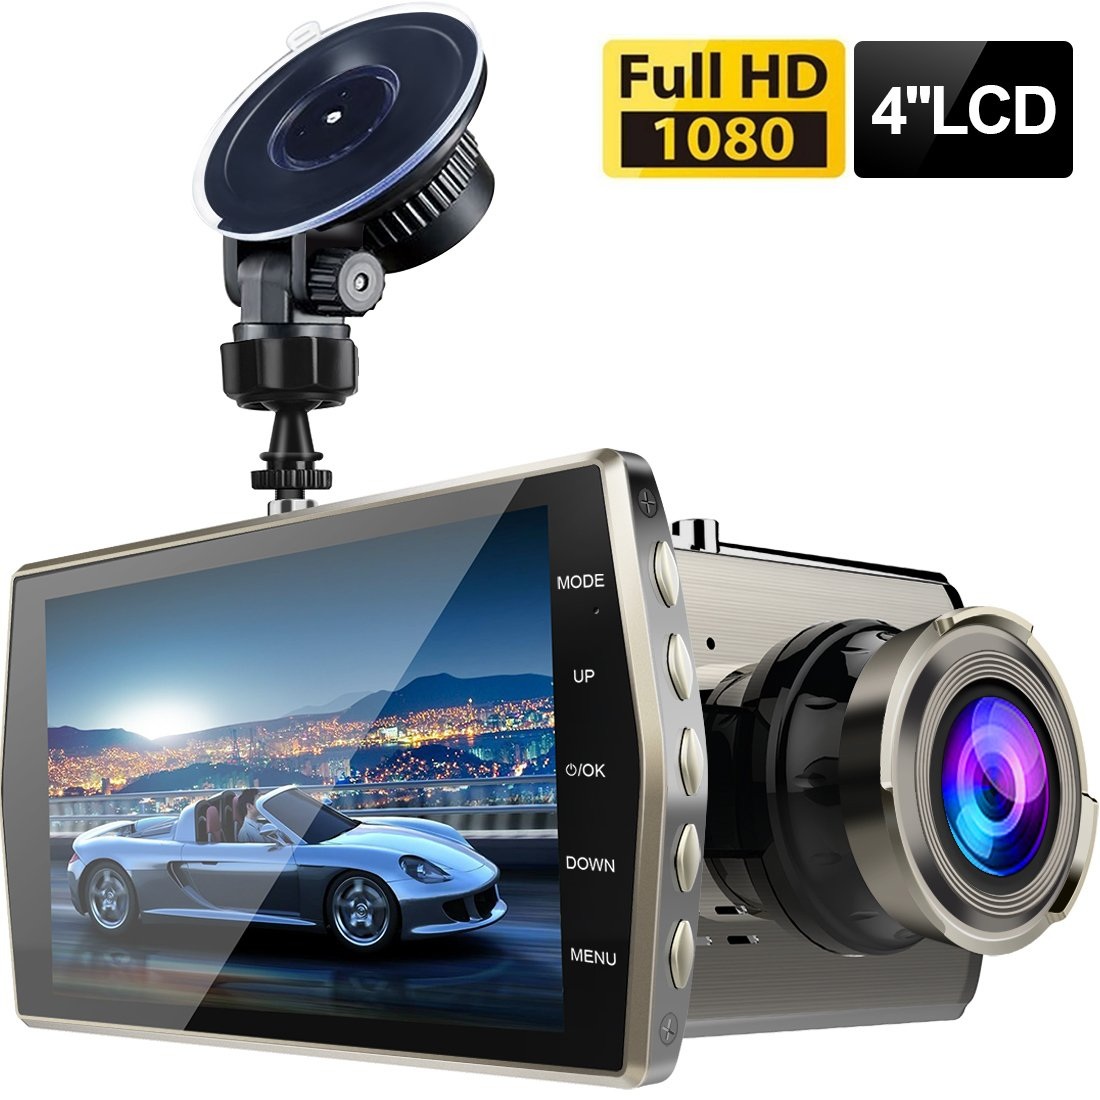 Dash Cam,Zintou Car Dash Cam Big 4'' LCD FHD 1080p 170 Degree Wide Angle Dashboard Camera Recorder with G-Sensor,NightHawk Vision,WDR, Loop Recording